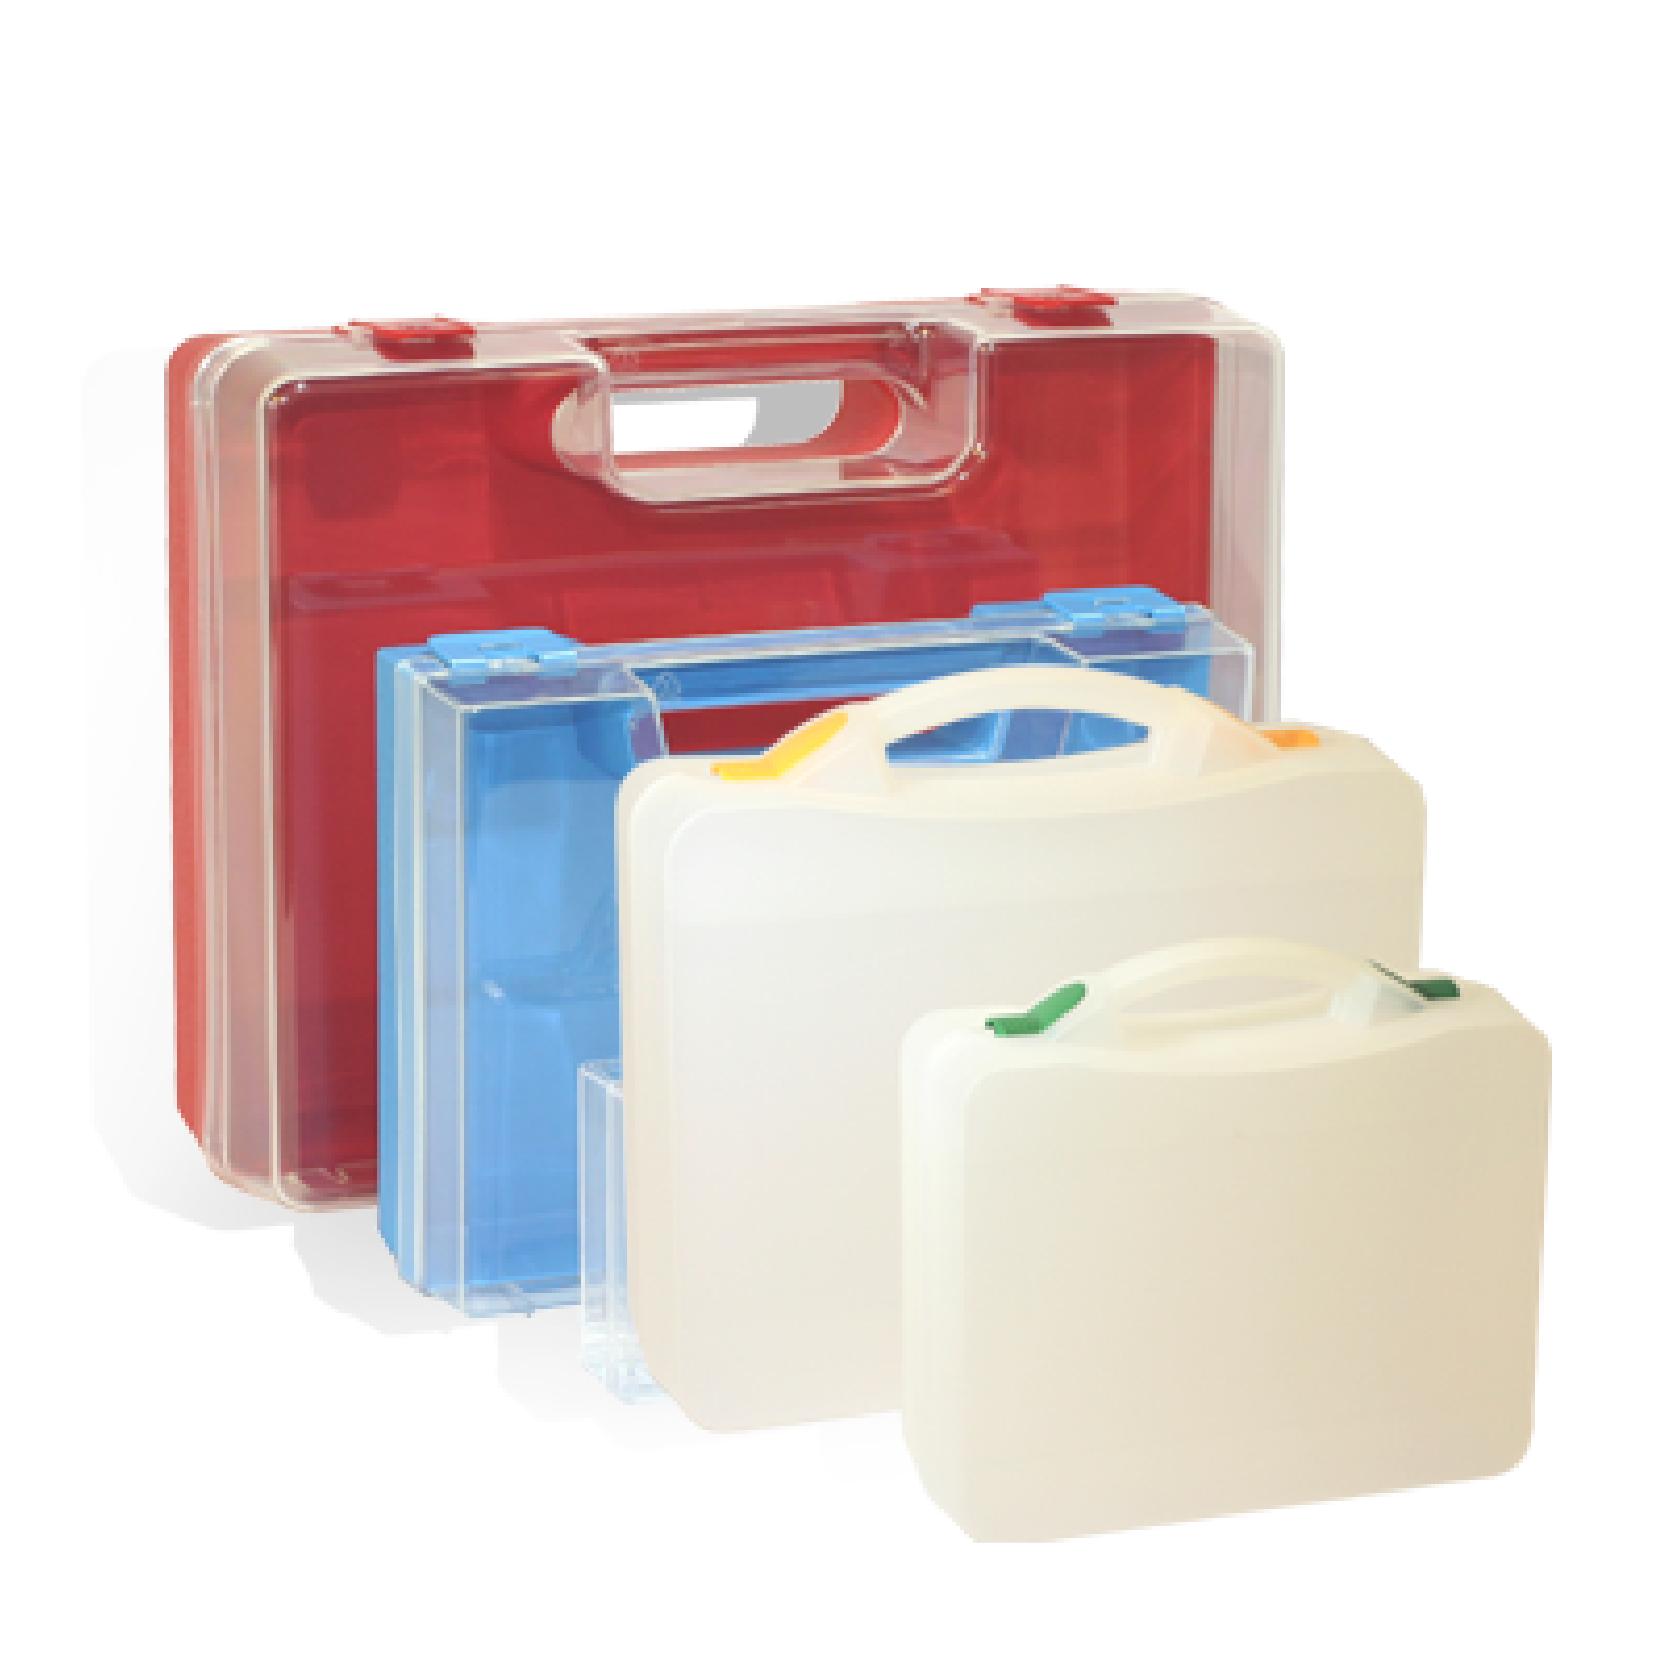 GAGGIONE eplasticase mallettes transparentes - technical cases transparent